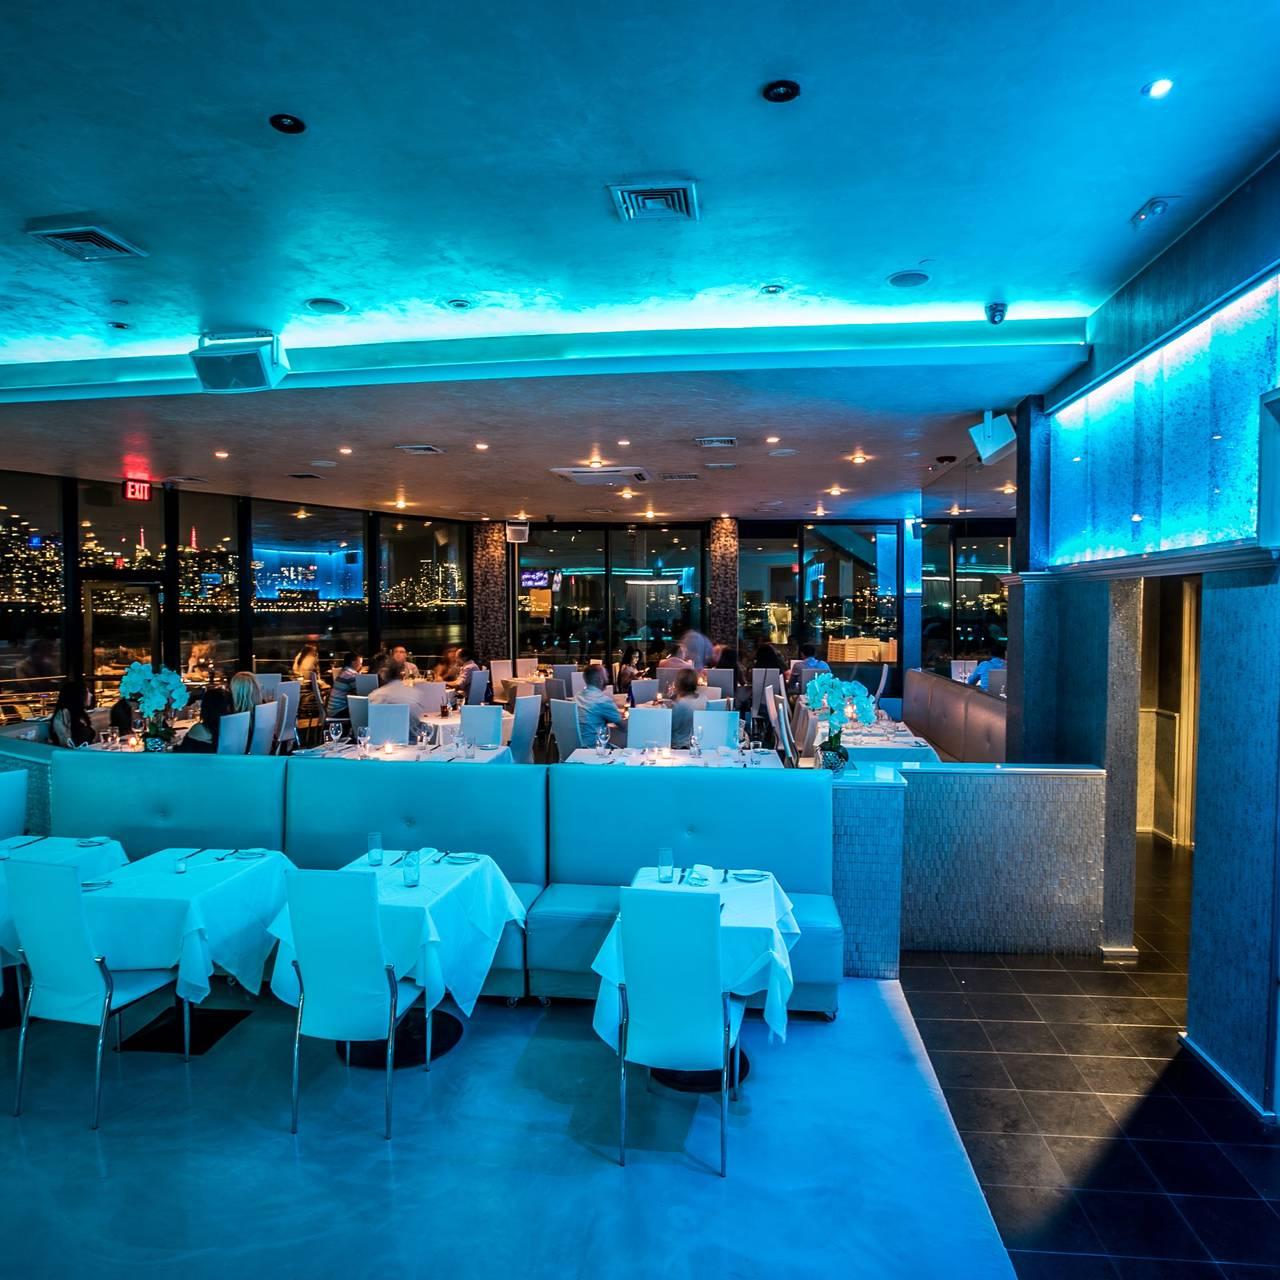 Waterside Restaurant And Catering North Bergen Nj Opentable